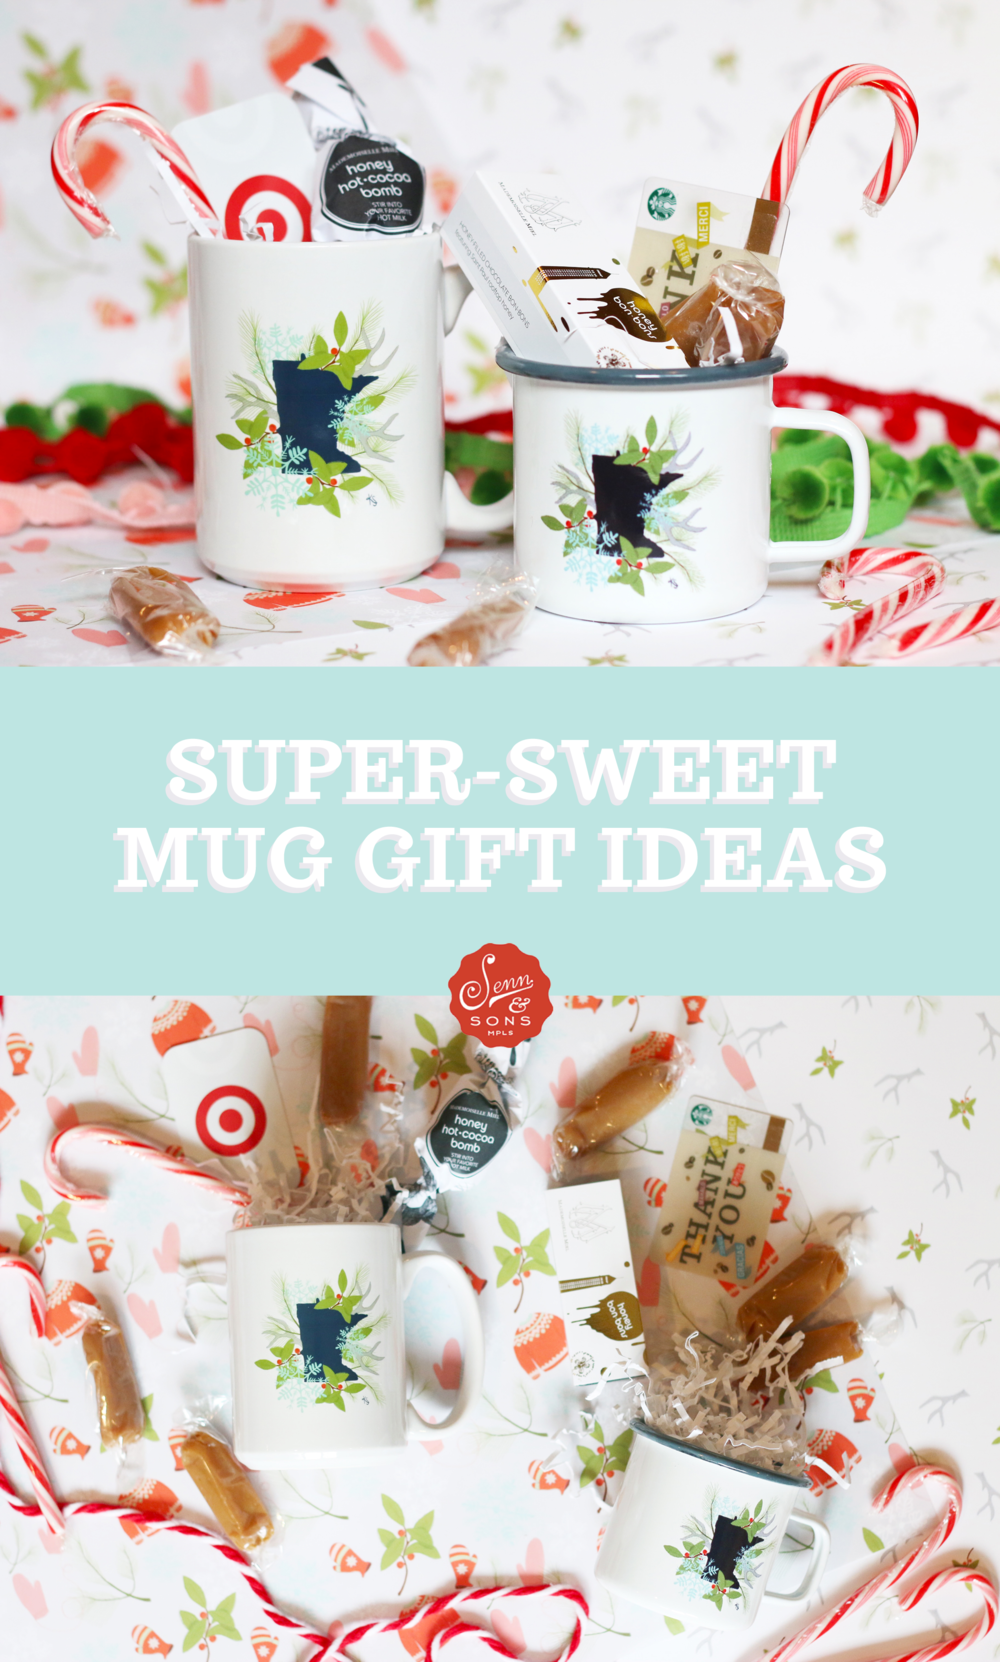 Mug Gift Ideas.png